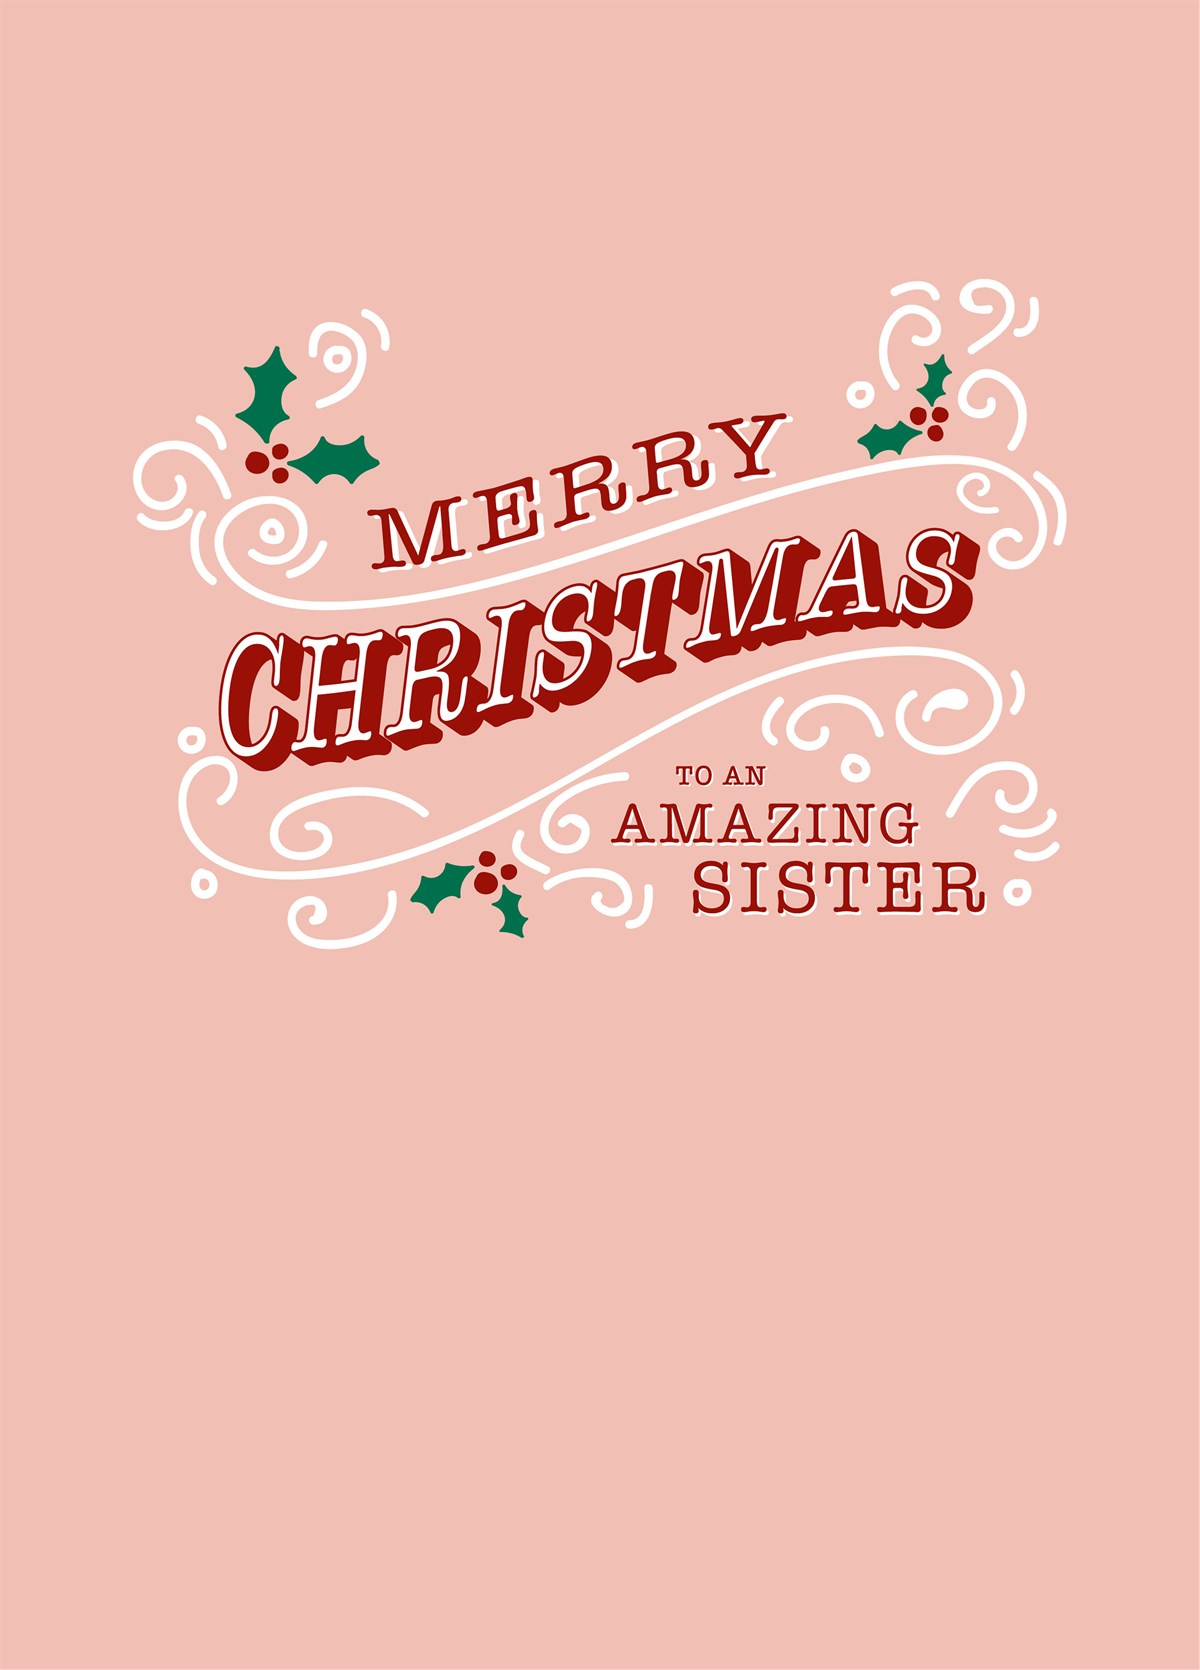 Merry Christmas Sister.Merry Christmas Amazing Sister